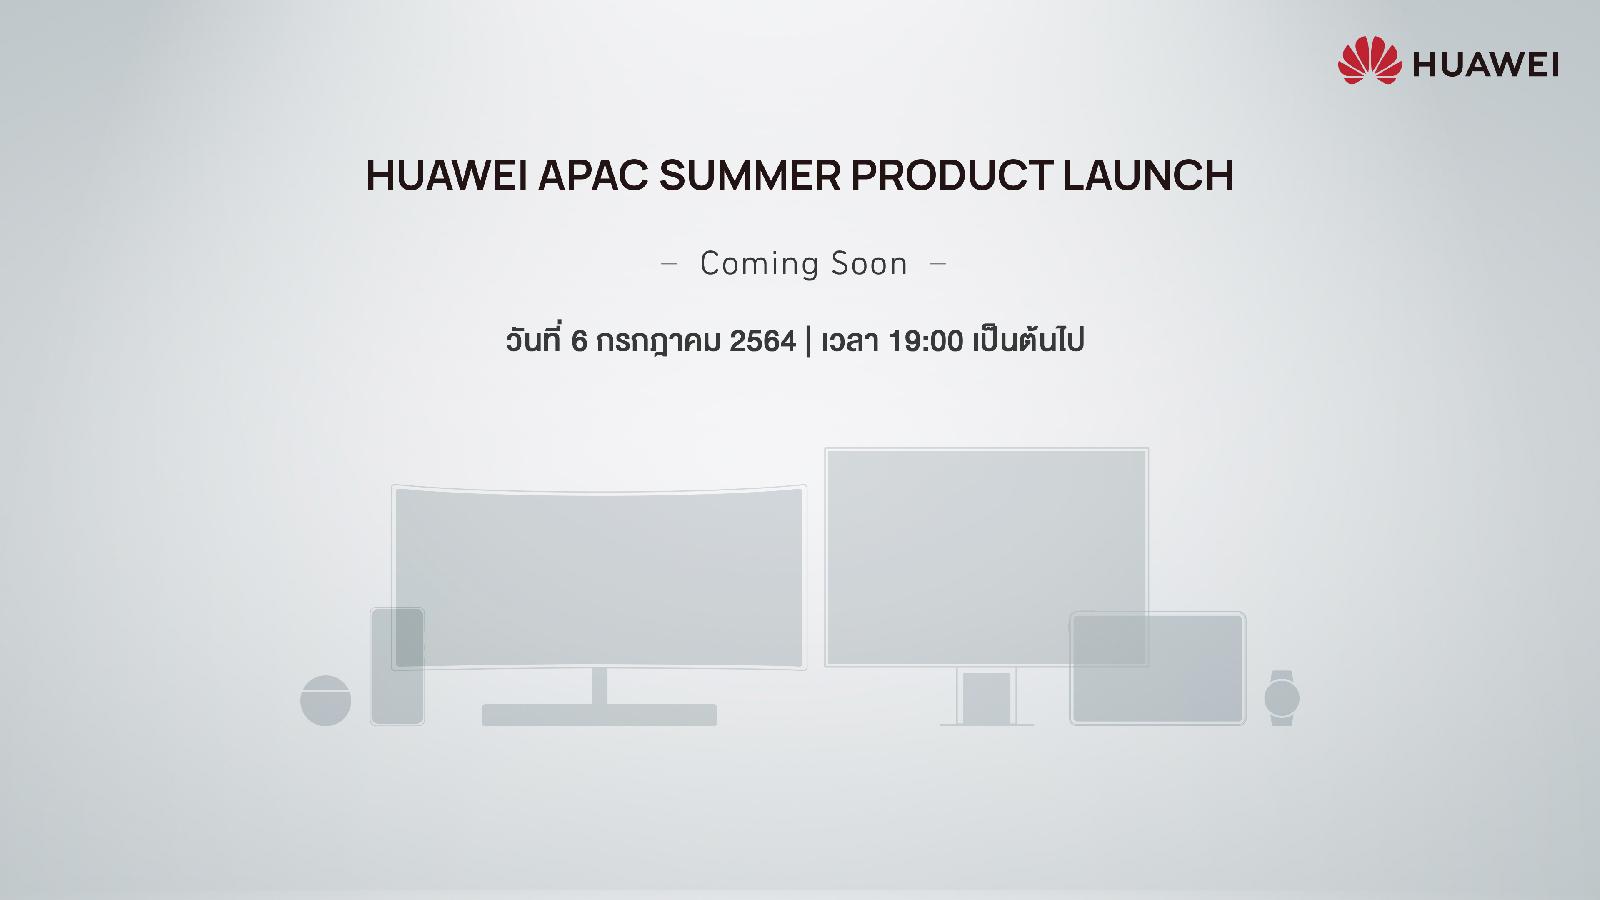 Huawei เดินเกมรุก ยกทัพไลน์อัพสินค้าล่าสุดจากหลากหลายกลุ่มผลิตภัณฑ์เตรียมเปิดตัวอย่างยิ่งใหญ่ 6 กรกฎาคม 2564 นี้ในงาน HUAWEI APAC SUMMER PRODUCT LAUNCH